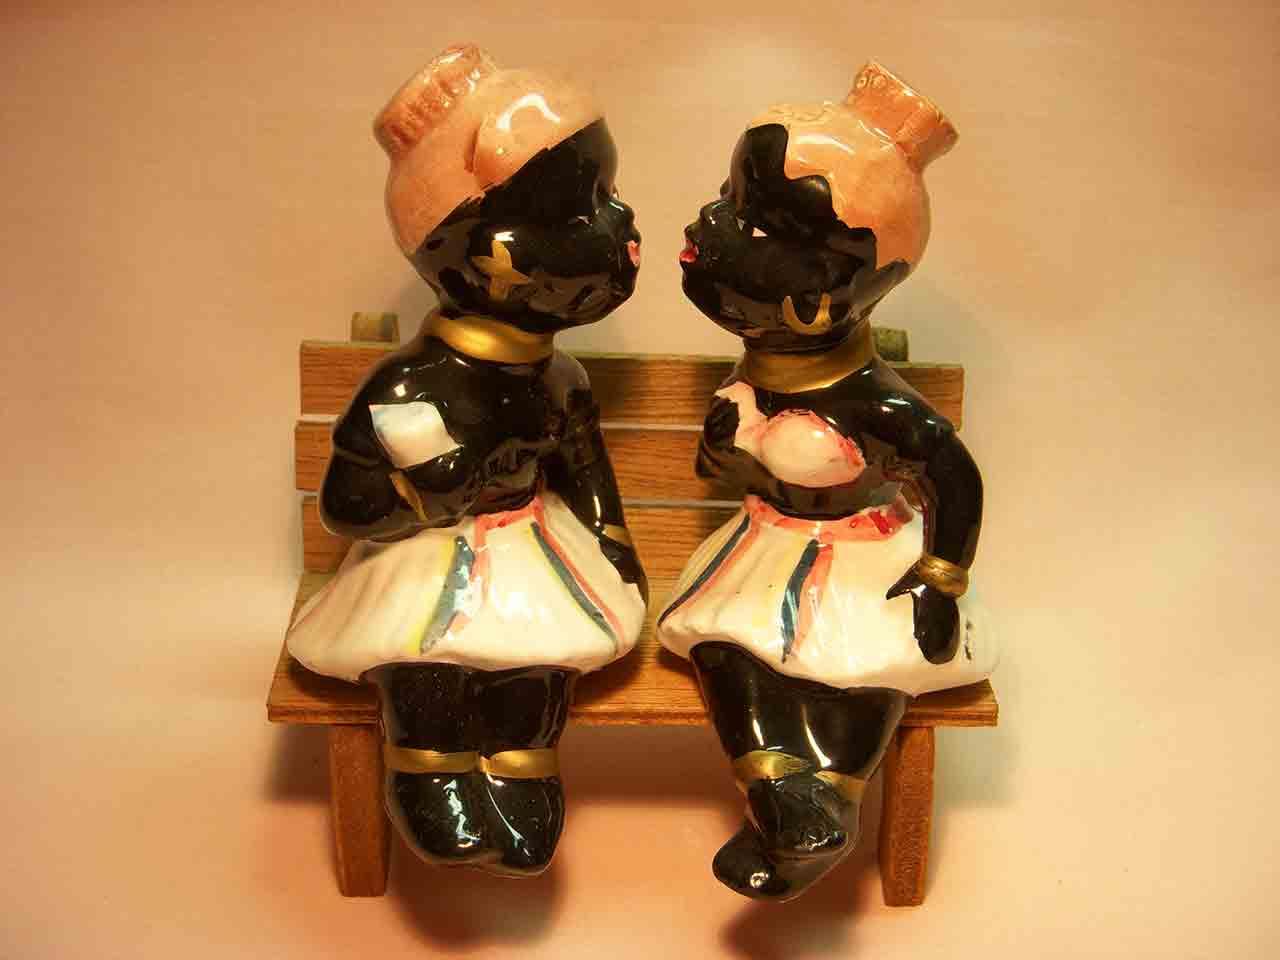 Black natives kissing sitting on wooden bench salt and pepper shaker